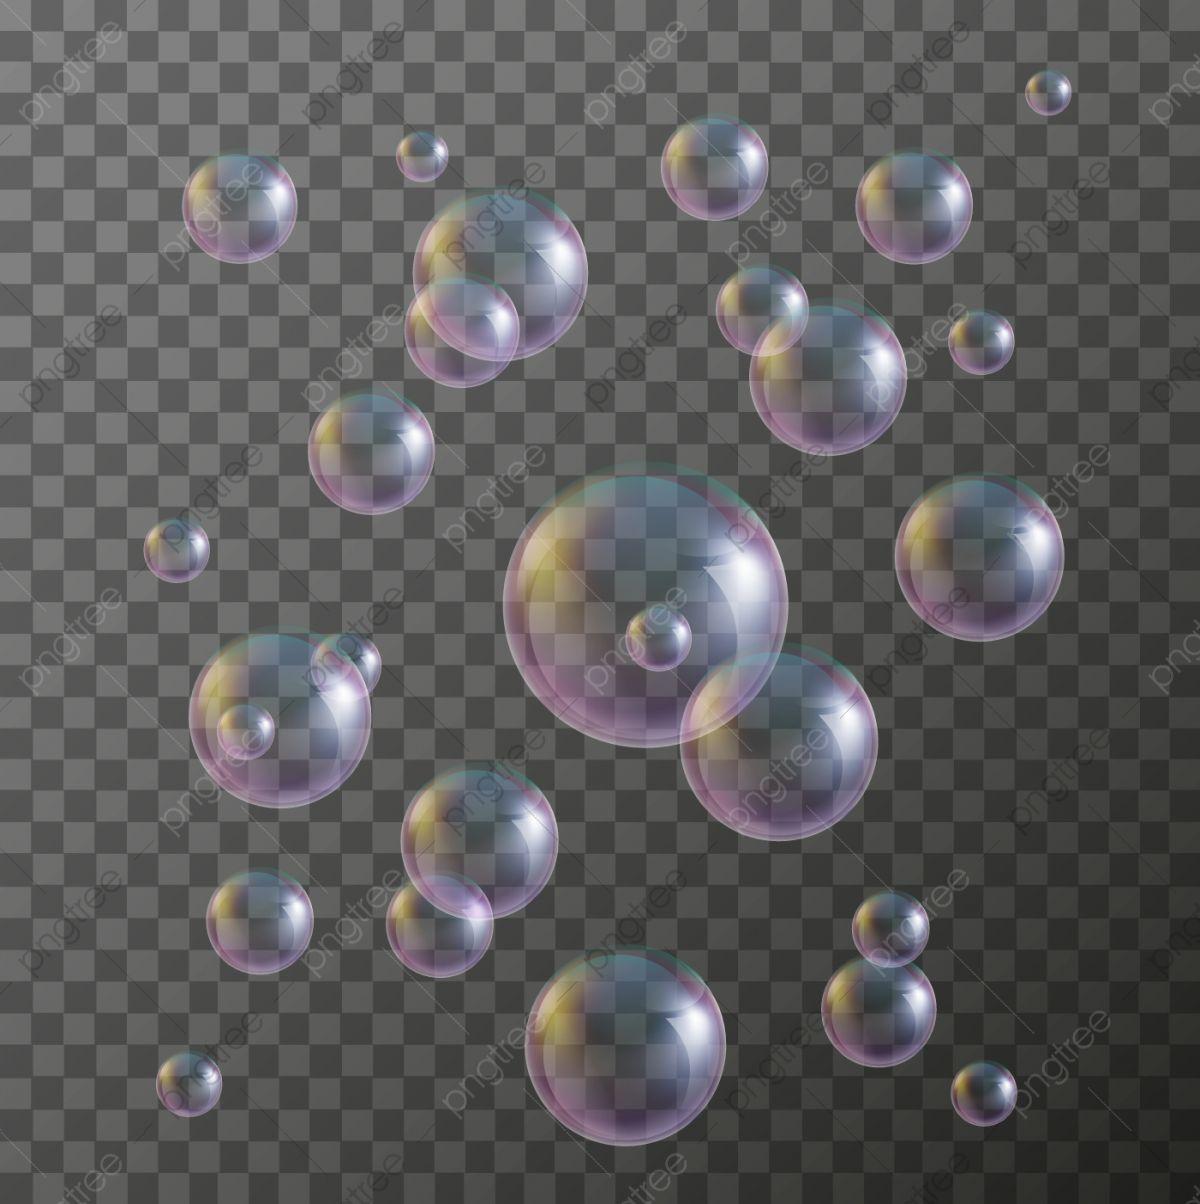 Water Soap Bubbles Realistic Vector Element Bubbles Clipart Bubbles Soap Png And Vector With Transparent Background For Free Download Soap Bubbles Bubbles Bubbles Wallpaper